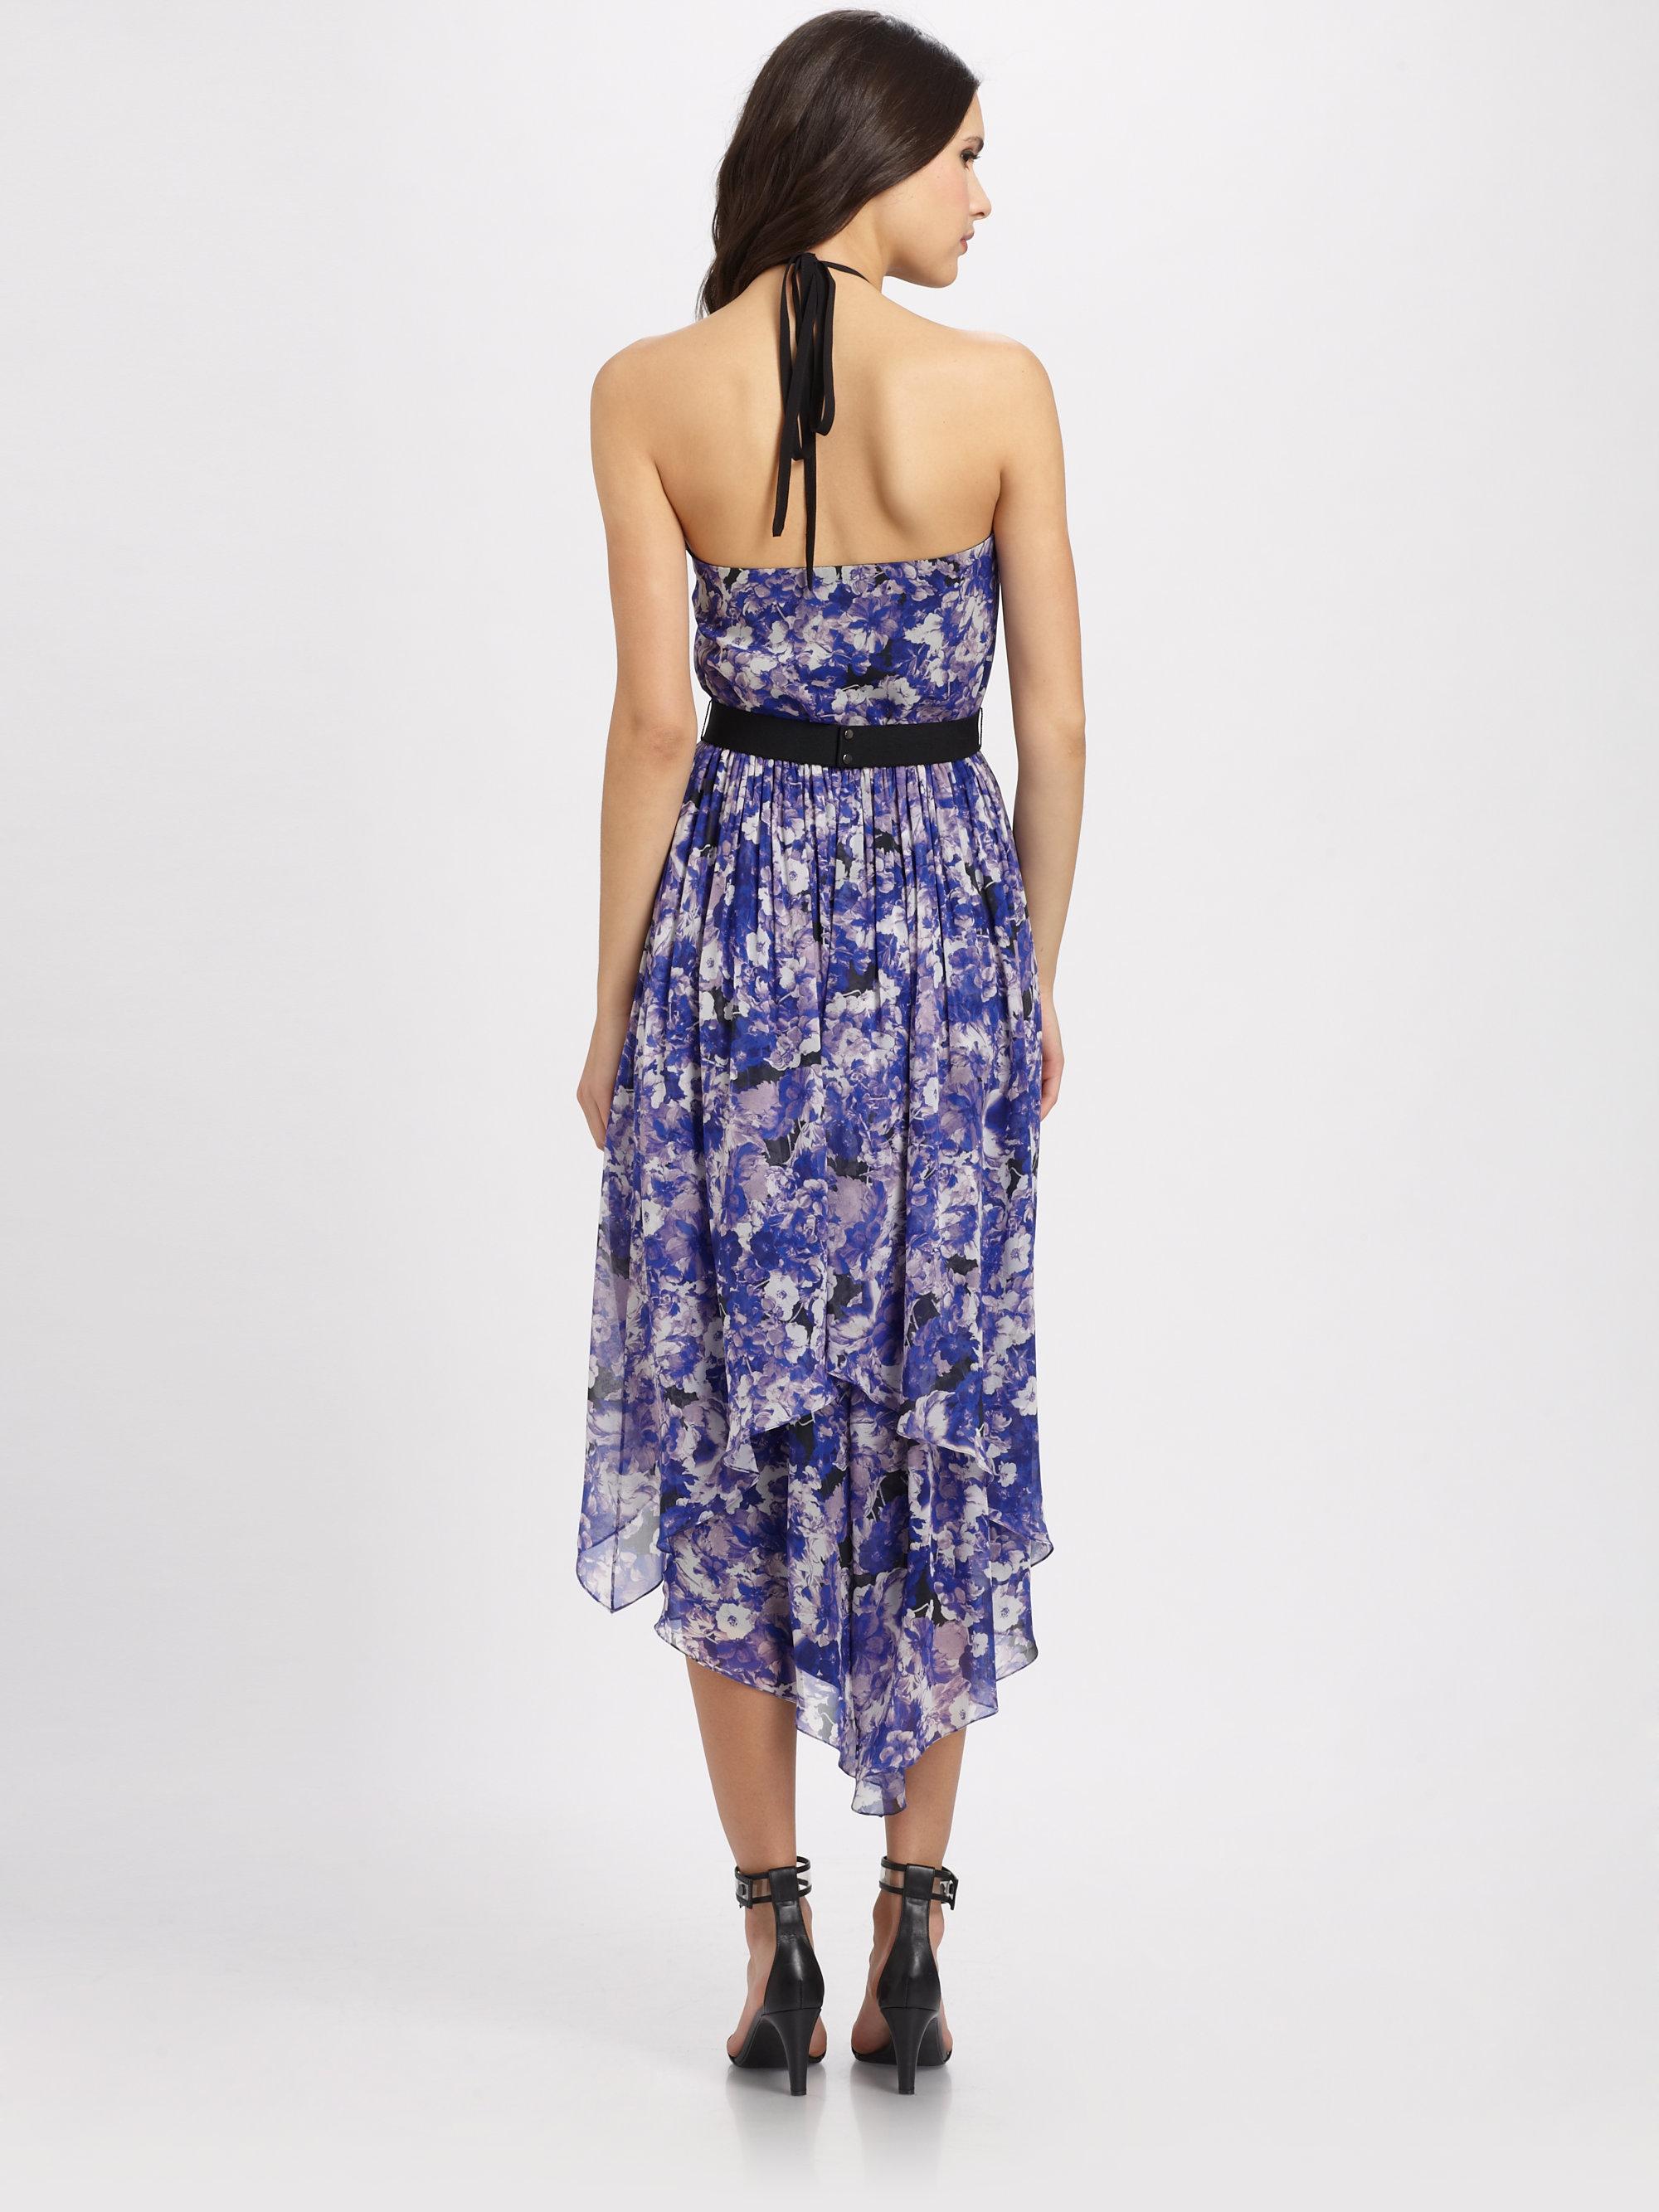 Robert Rodriguez Floral Print Hilo Dress Lyst